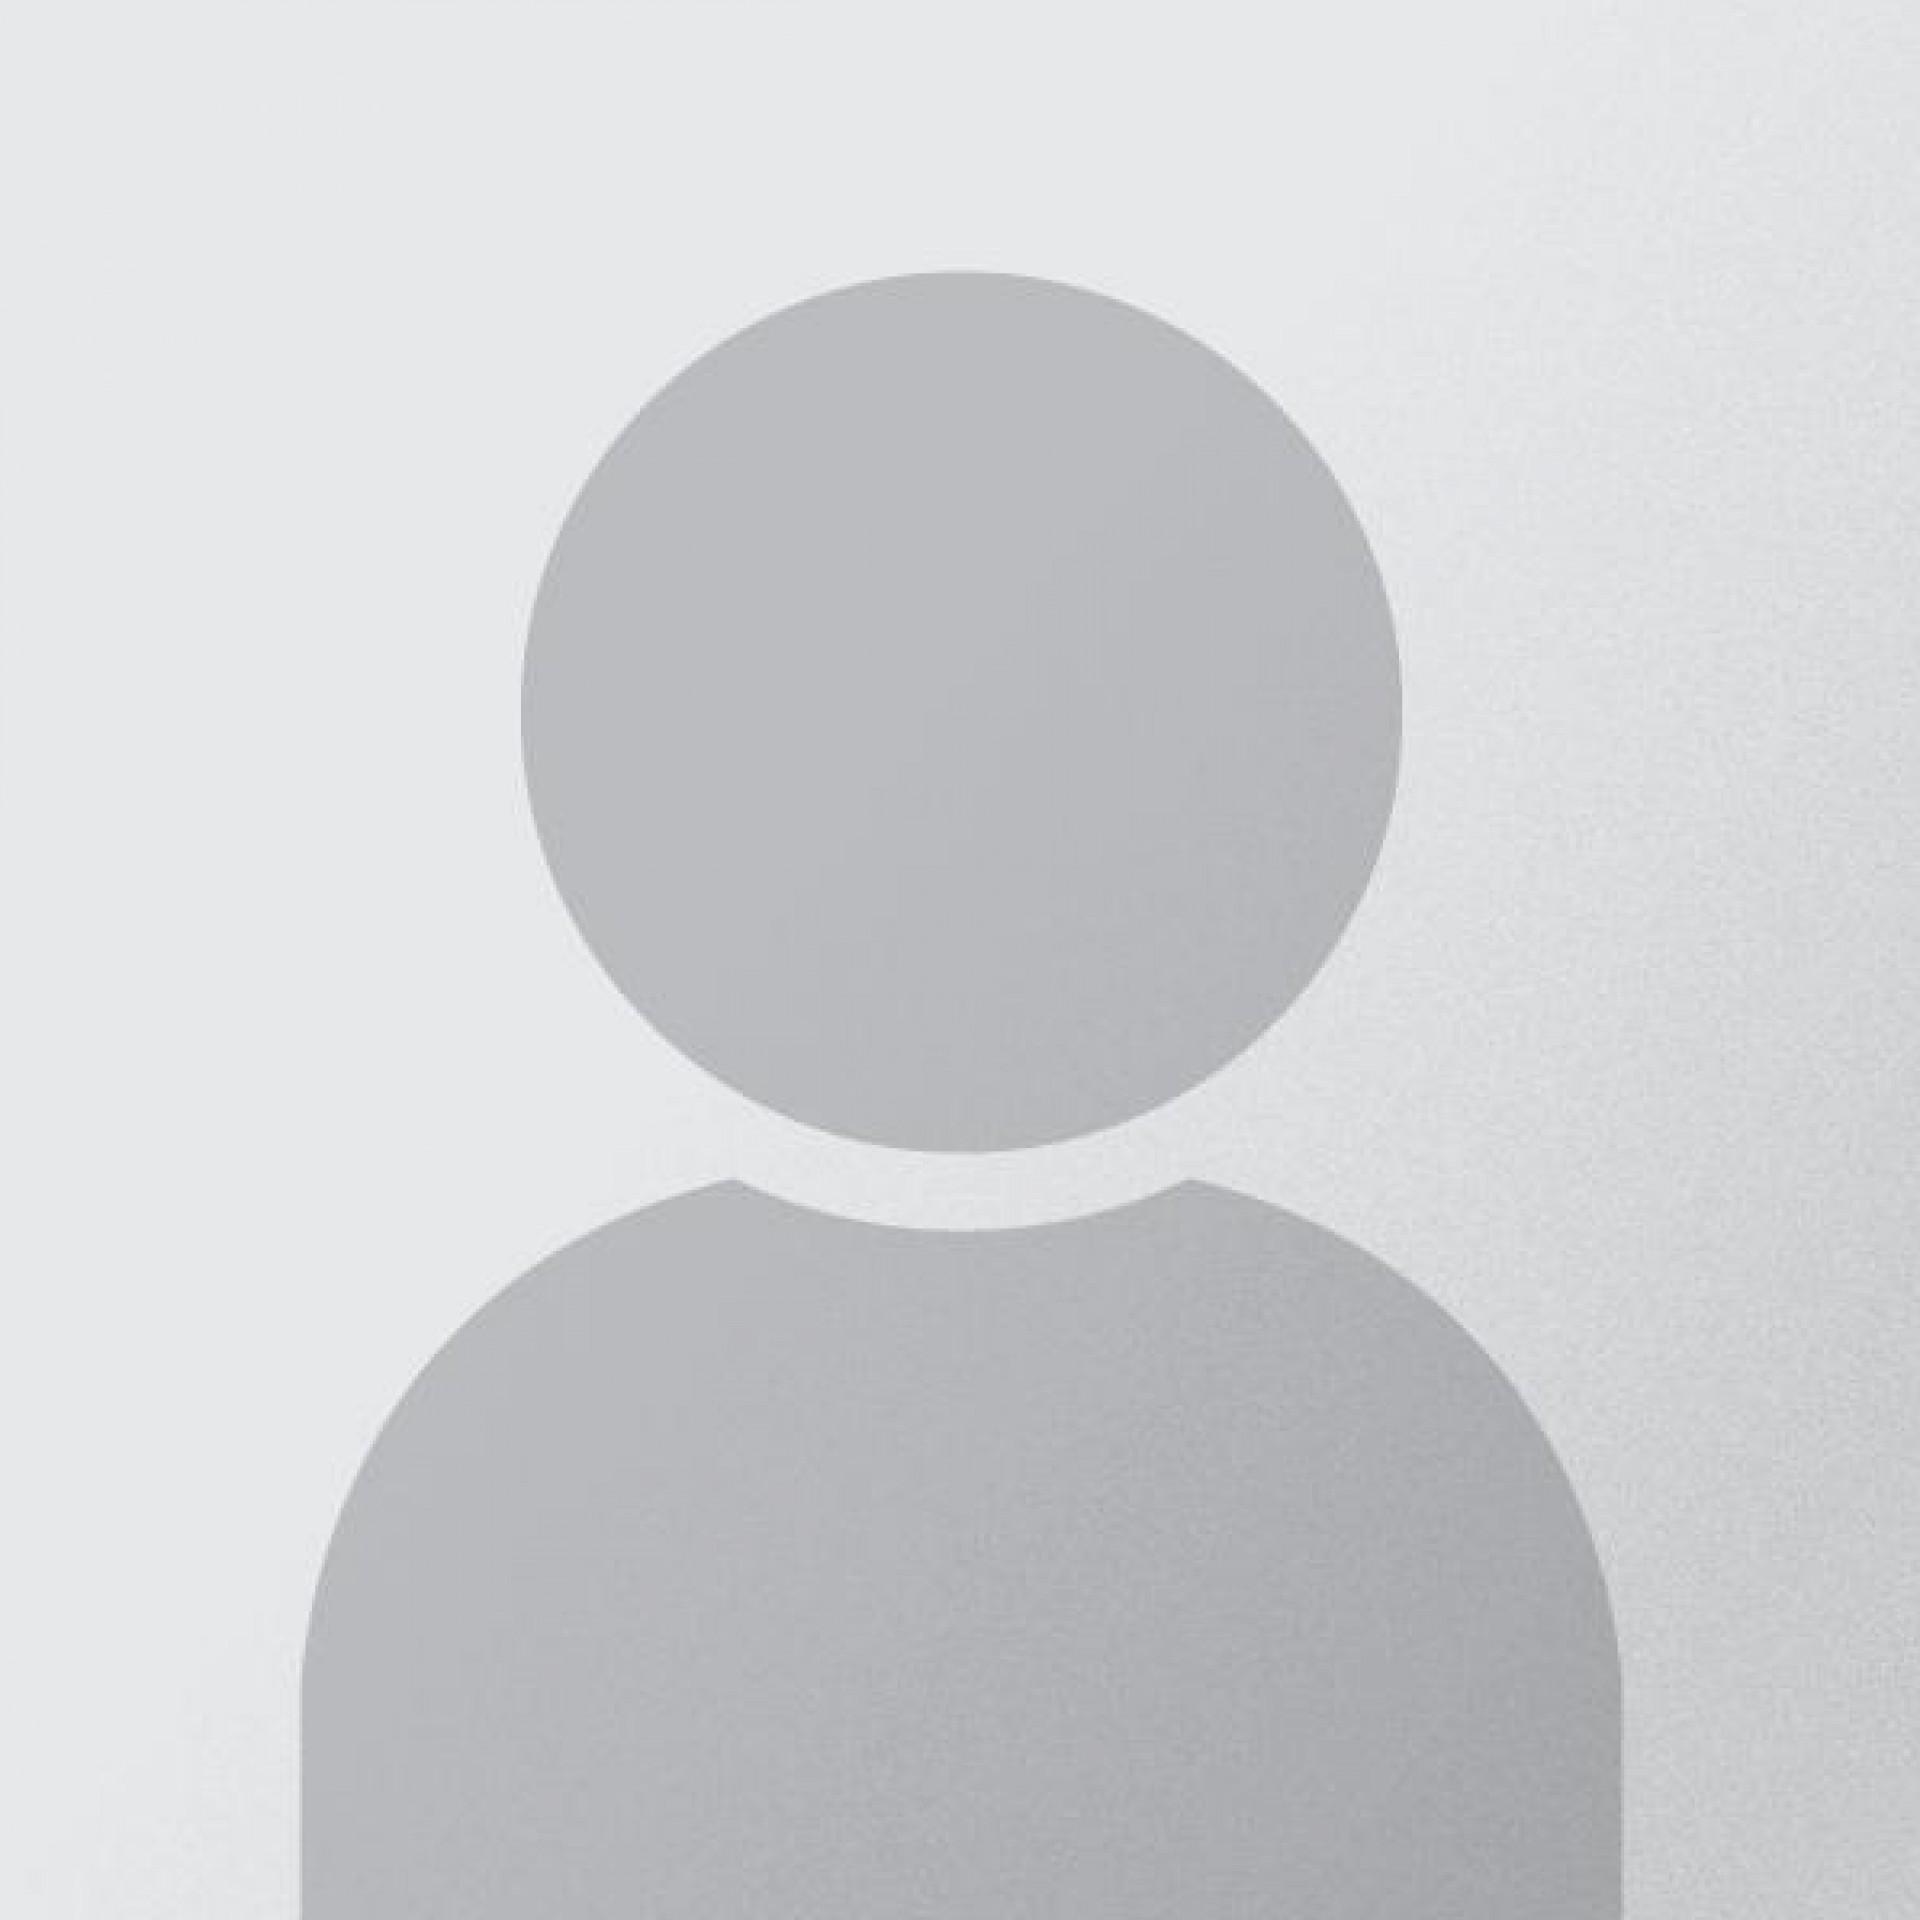 fotografia p021 profilu 0102K3BM6V